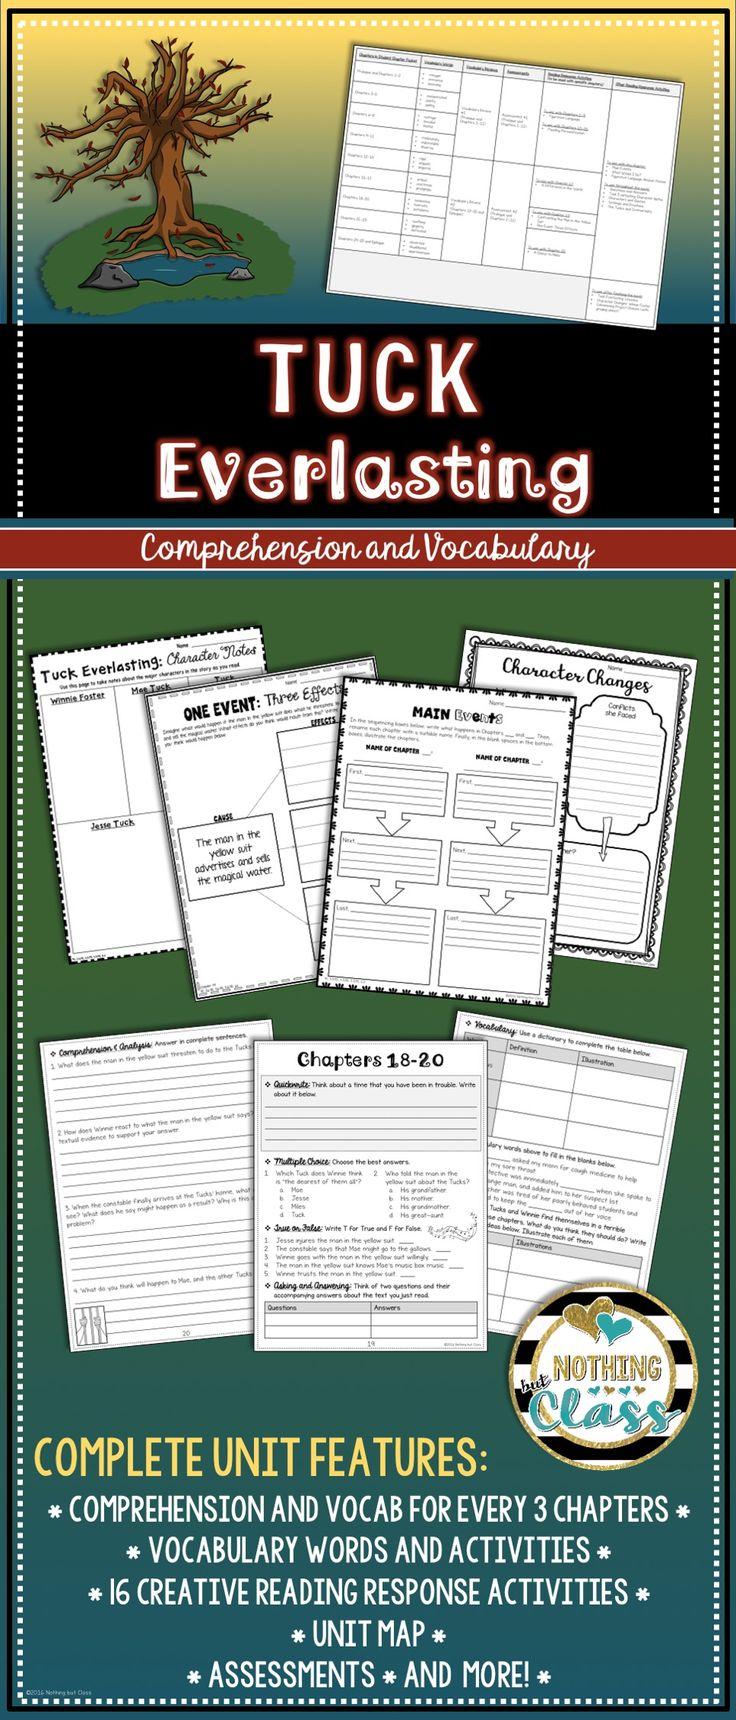 https://www.teacherspayteachers.com/Product/Tuck-Everlasting-Novel-Study-Unit-comprehension-vocabulary-activities-tests-2884569